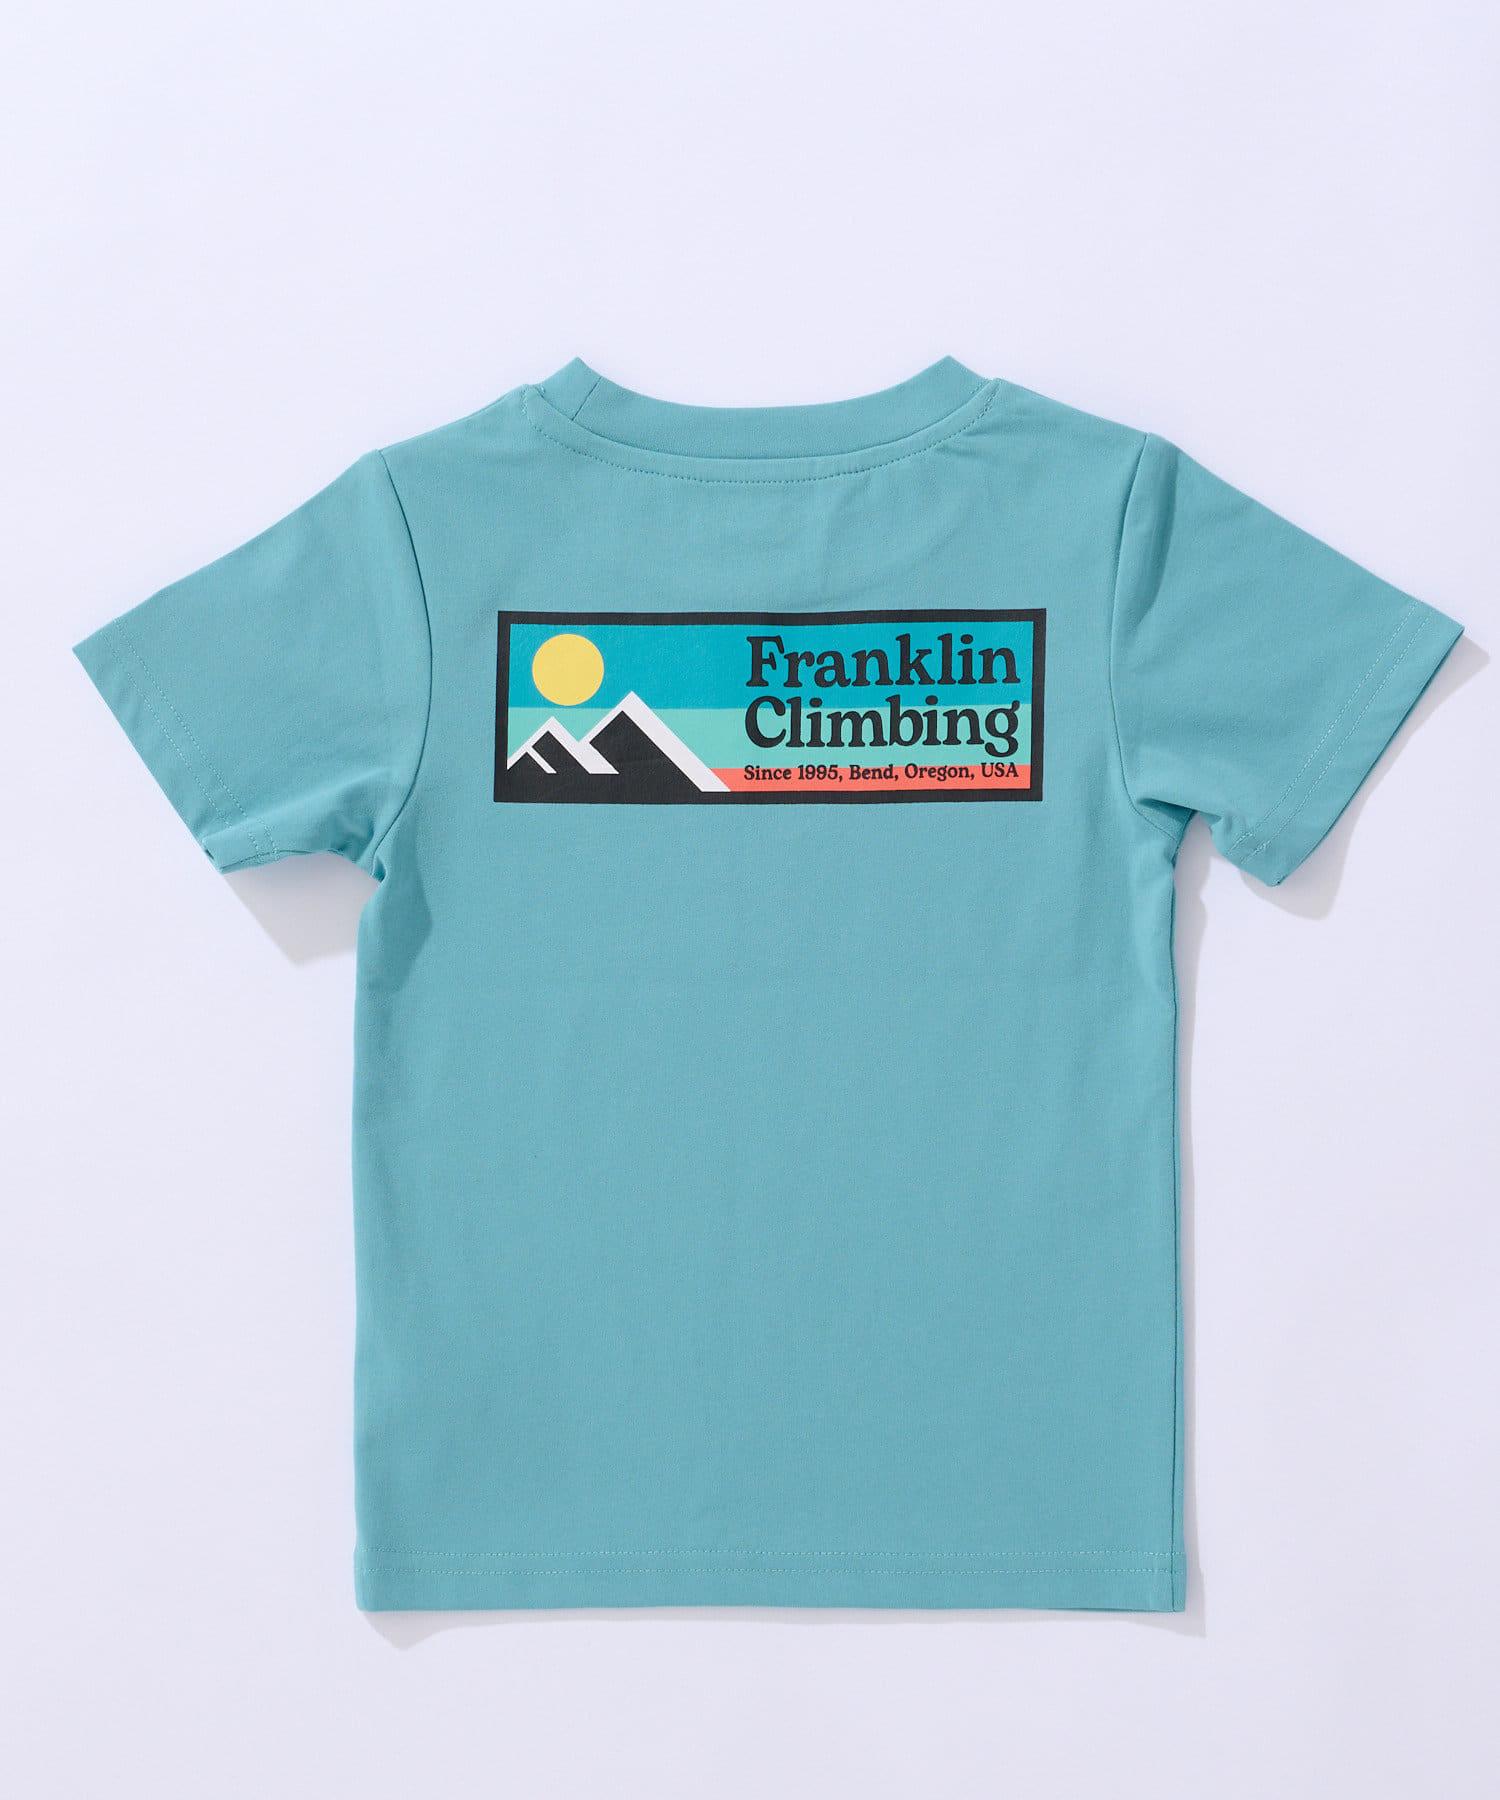 CIAOPANIC TYPY(チャオパニックティピー) 【Franklin Climbing】KID's ロゴTEE